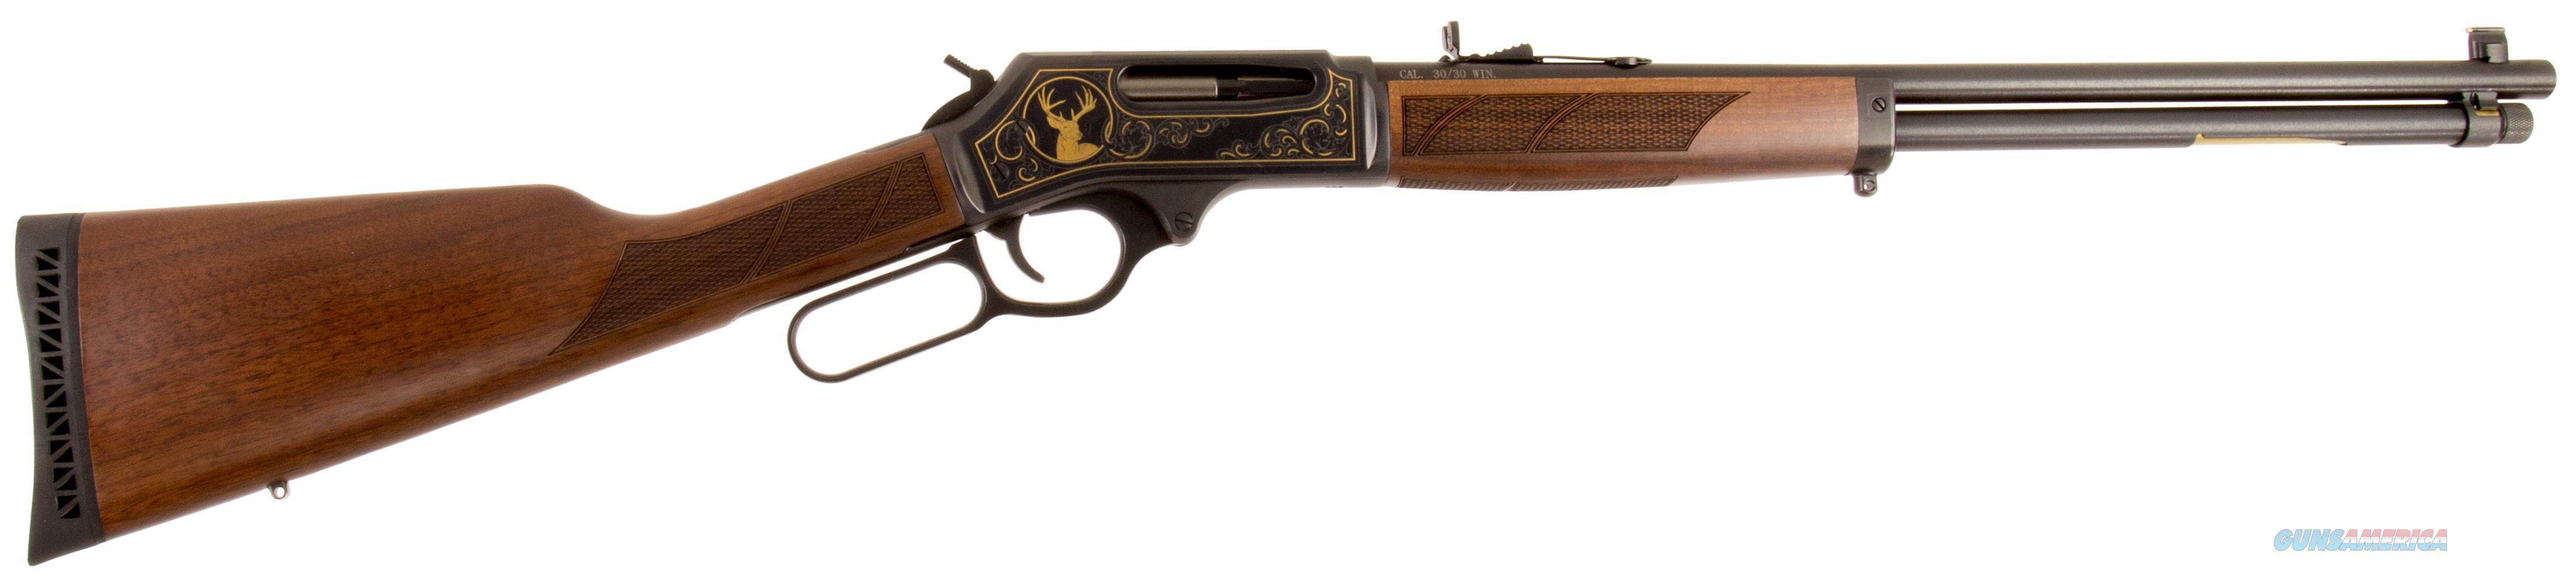 "Henry H009wl Large Caliber Wildlife Edition Lever 30-30 Winchester 20"" 5+1 American Walnut Stk Blued H009WL  Guns > Rifles > H Misc Rifles"